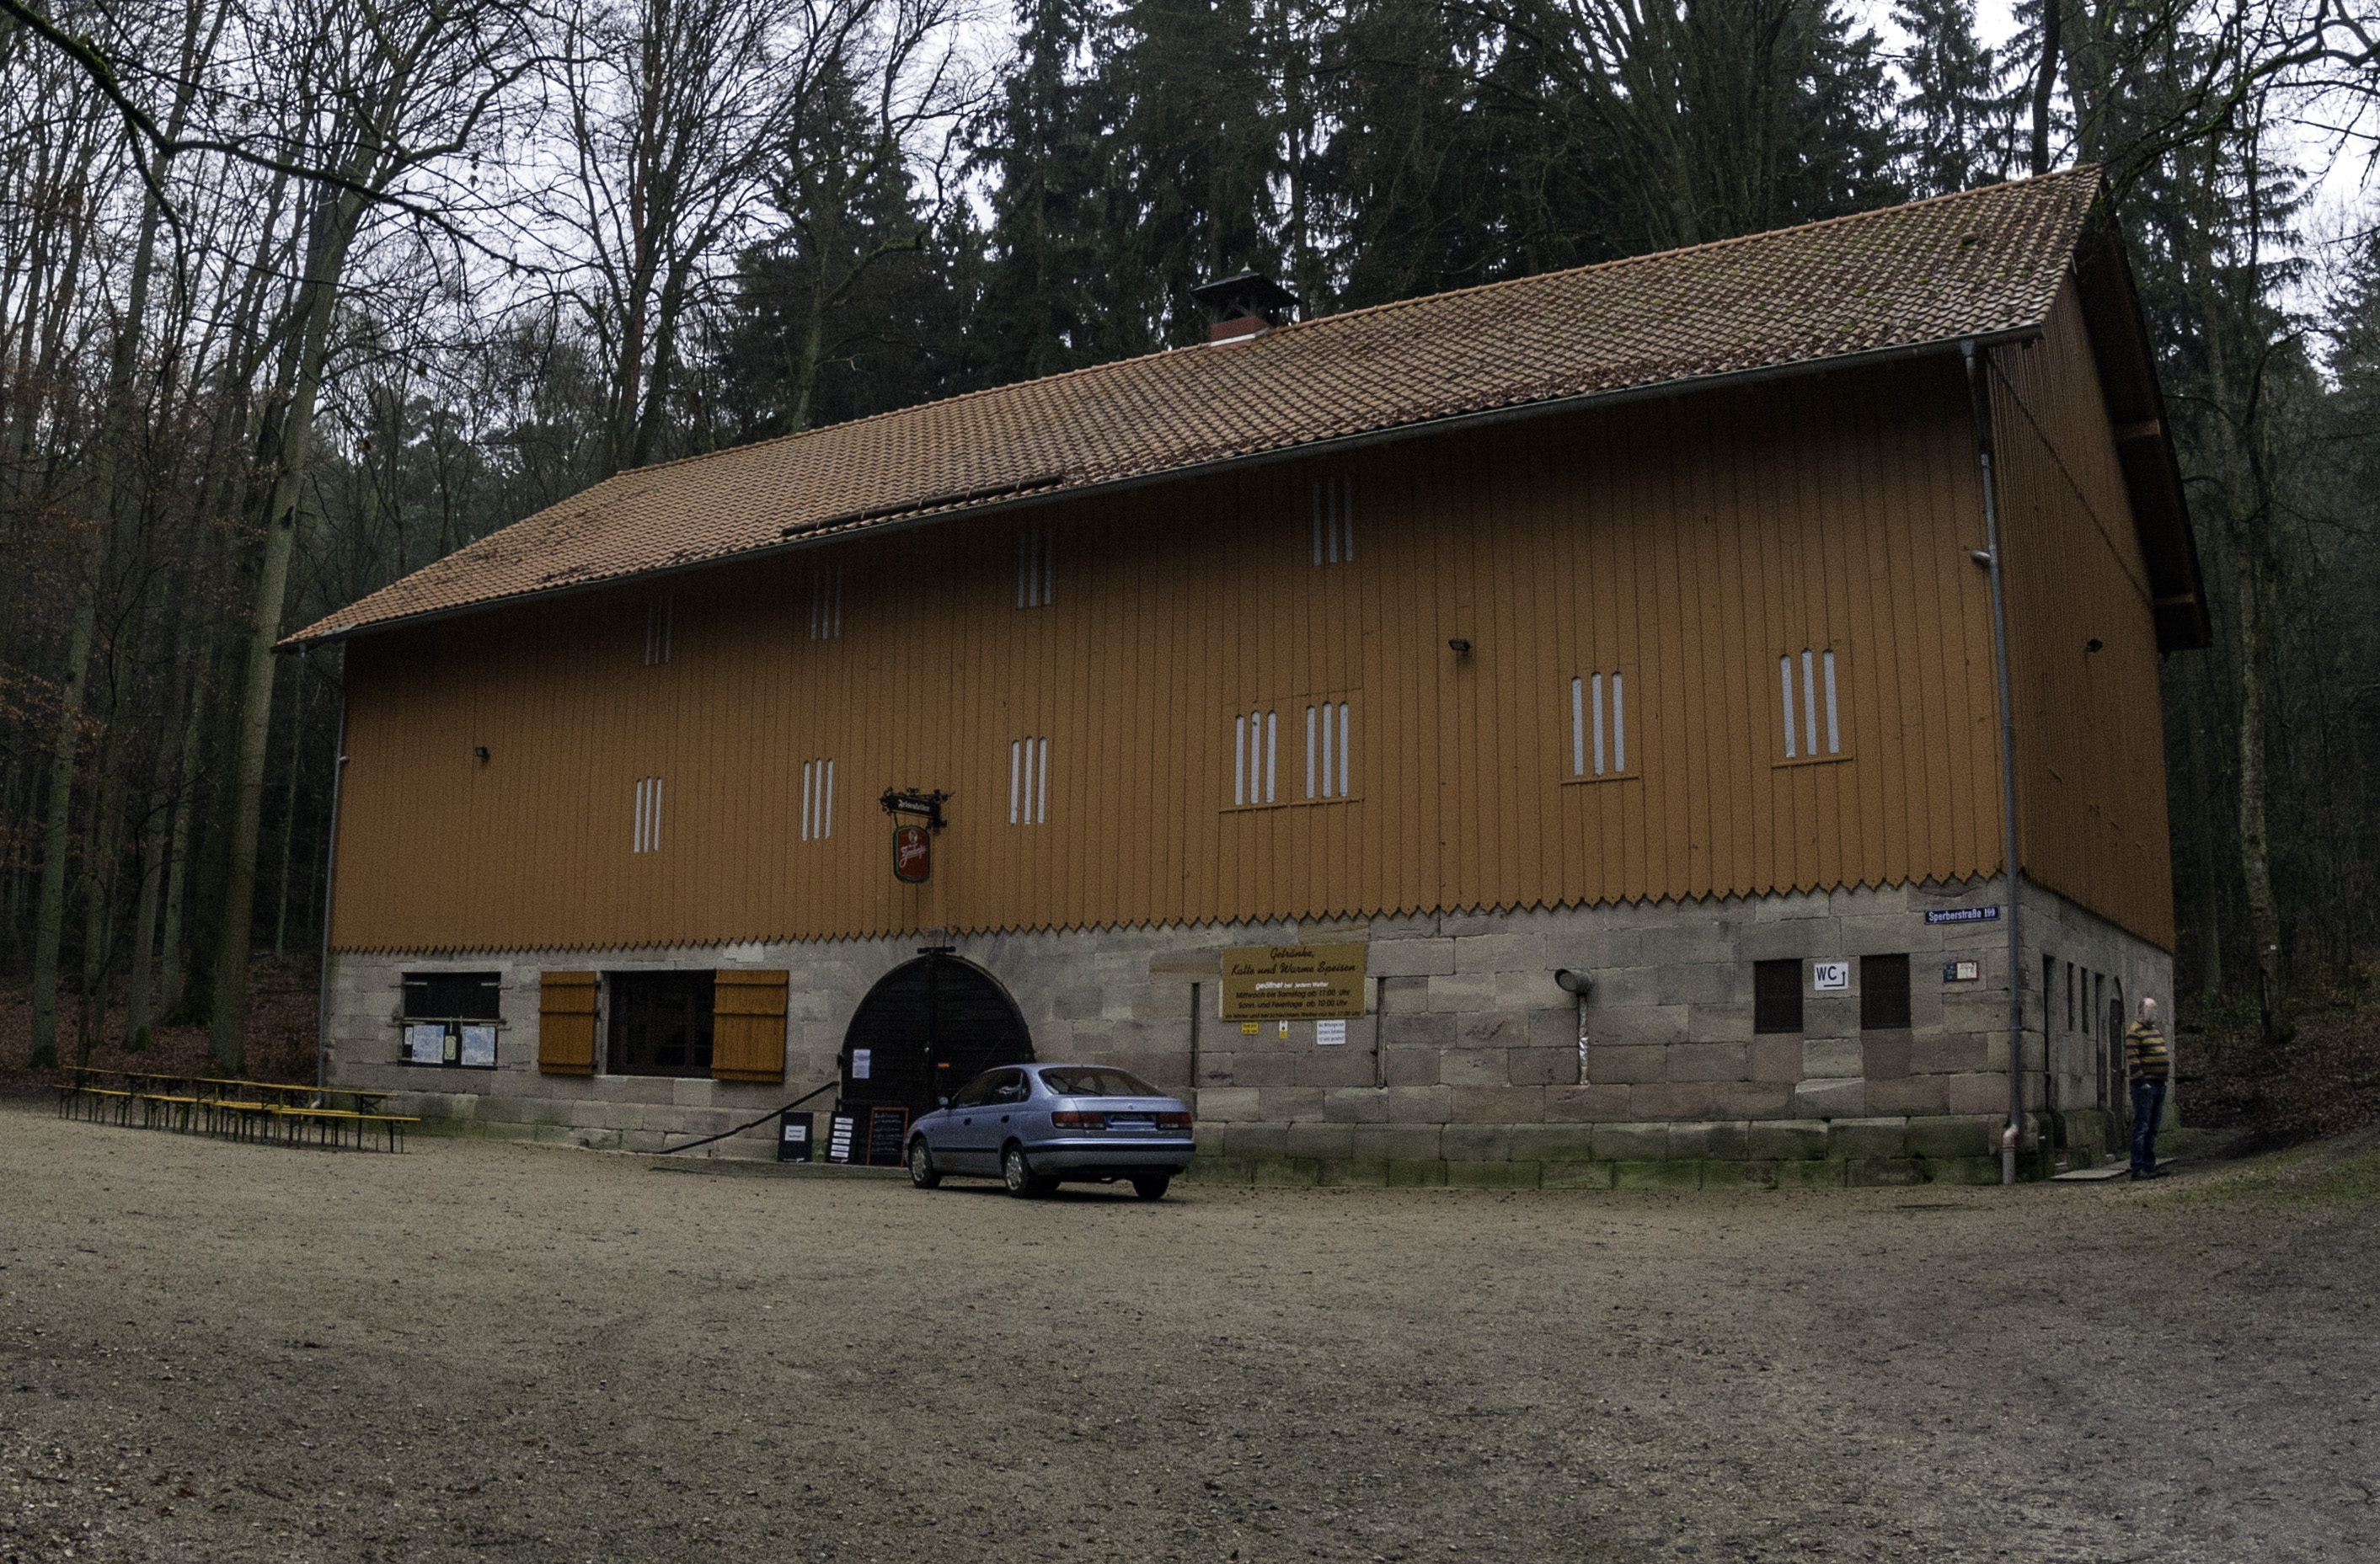 Datei:Felsenkeller Fürth 01.jpg – Wikipedia